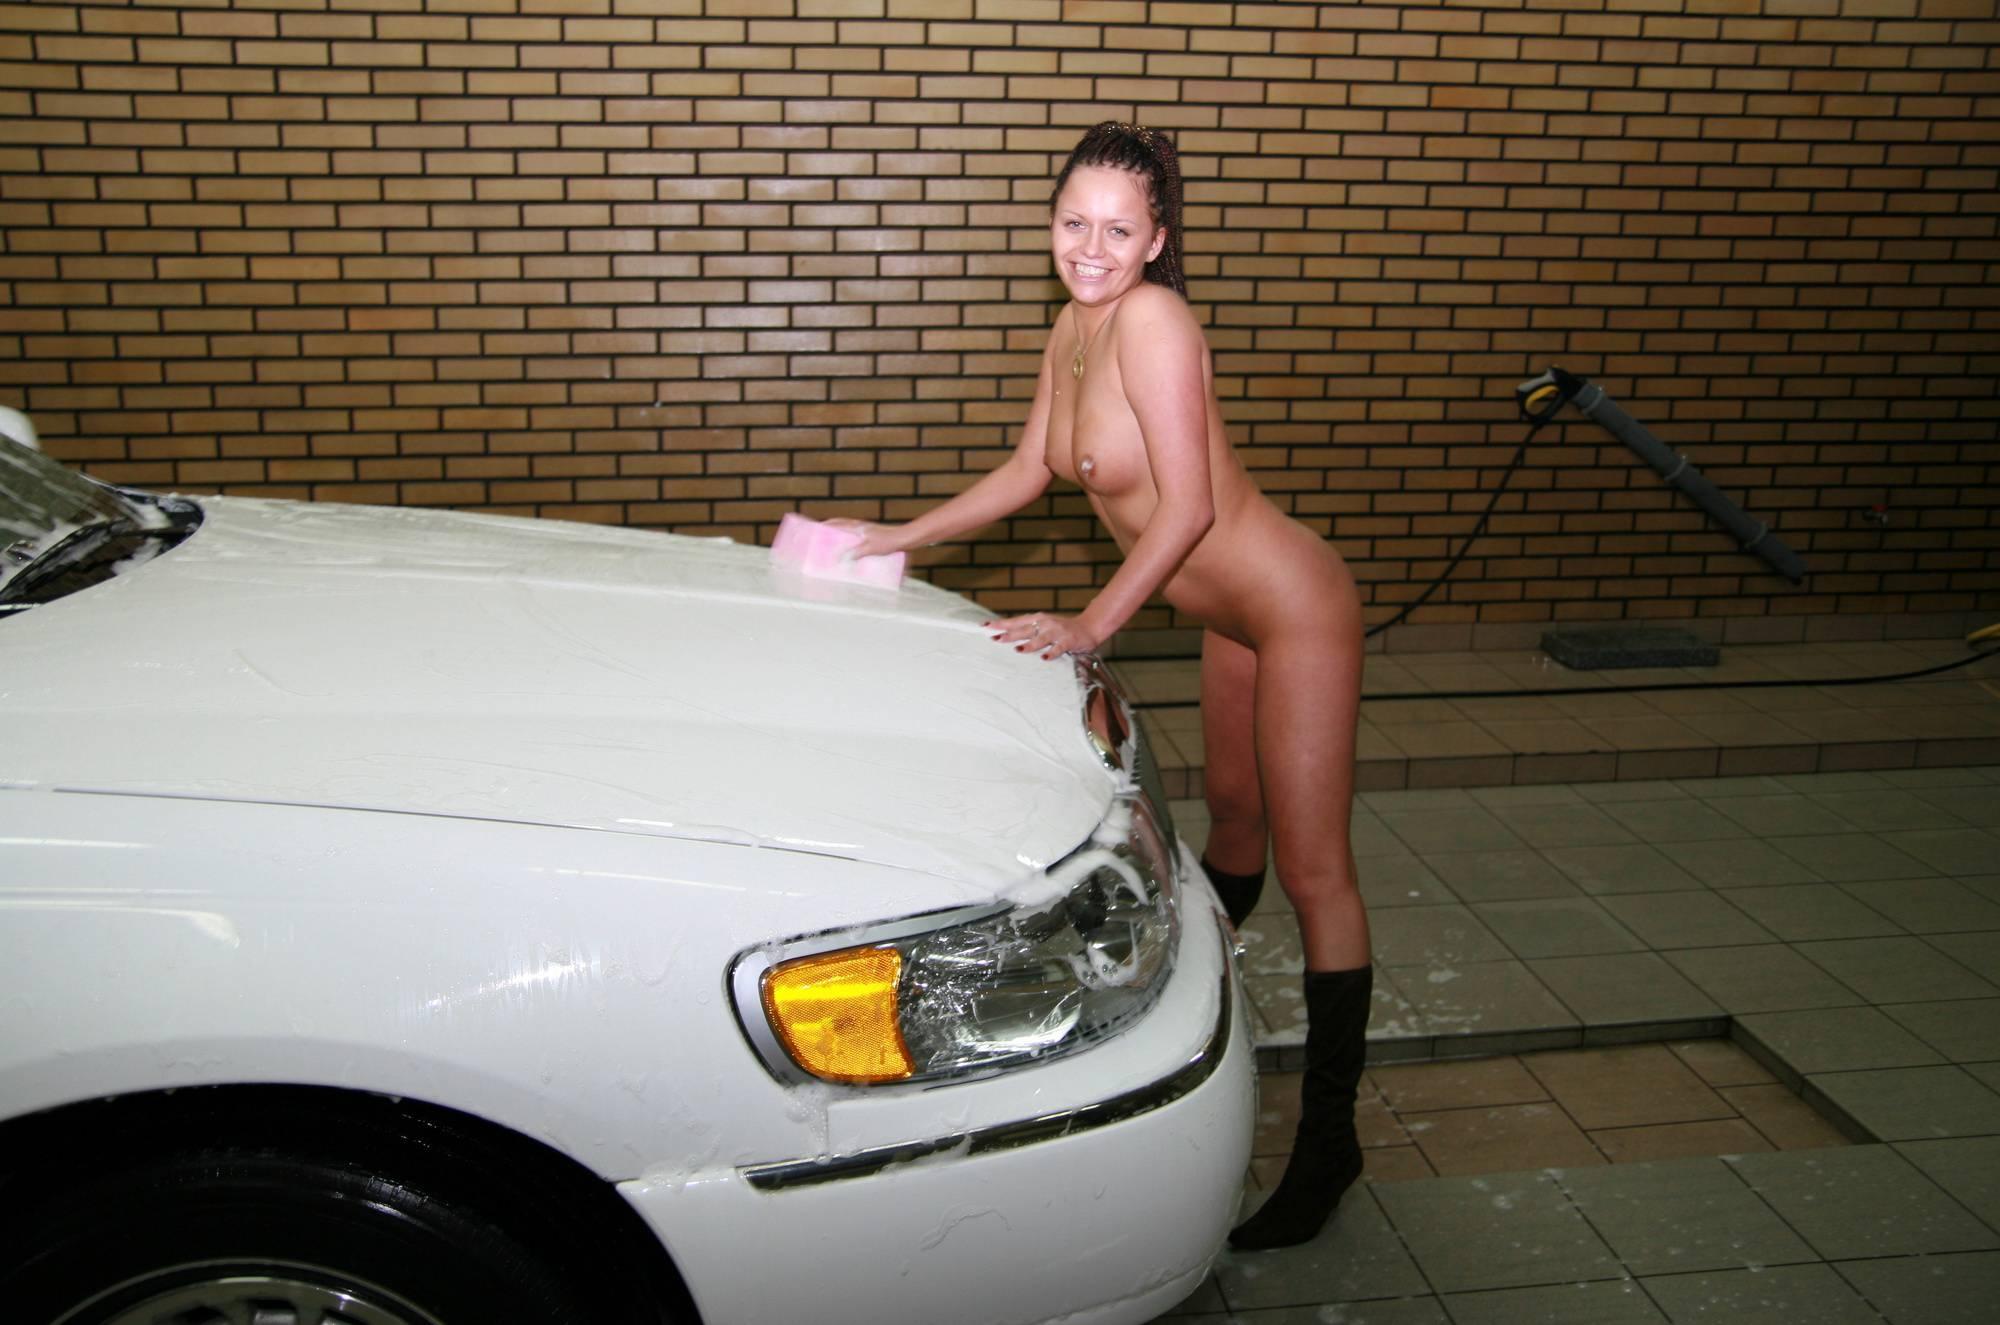 Nude Limousine Carwash - 2